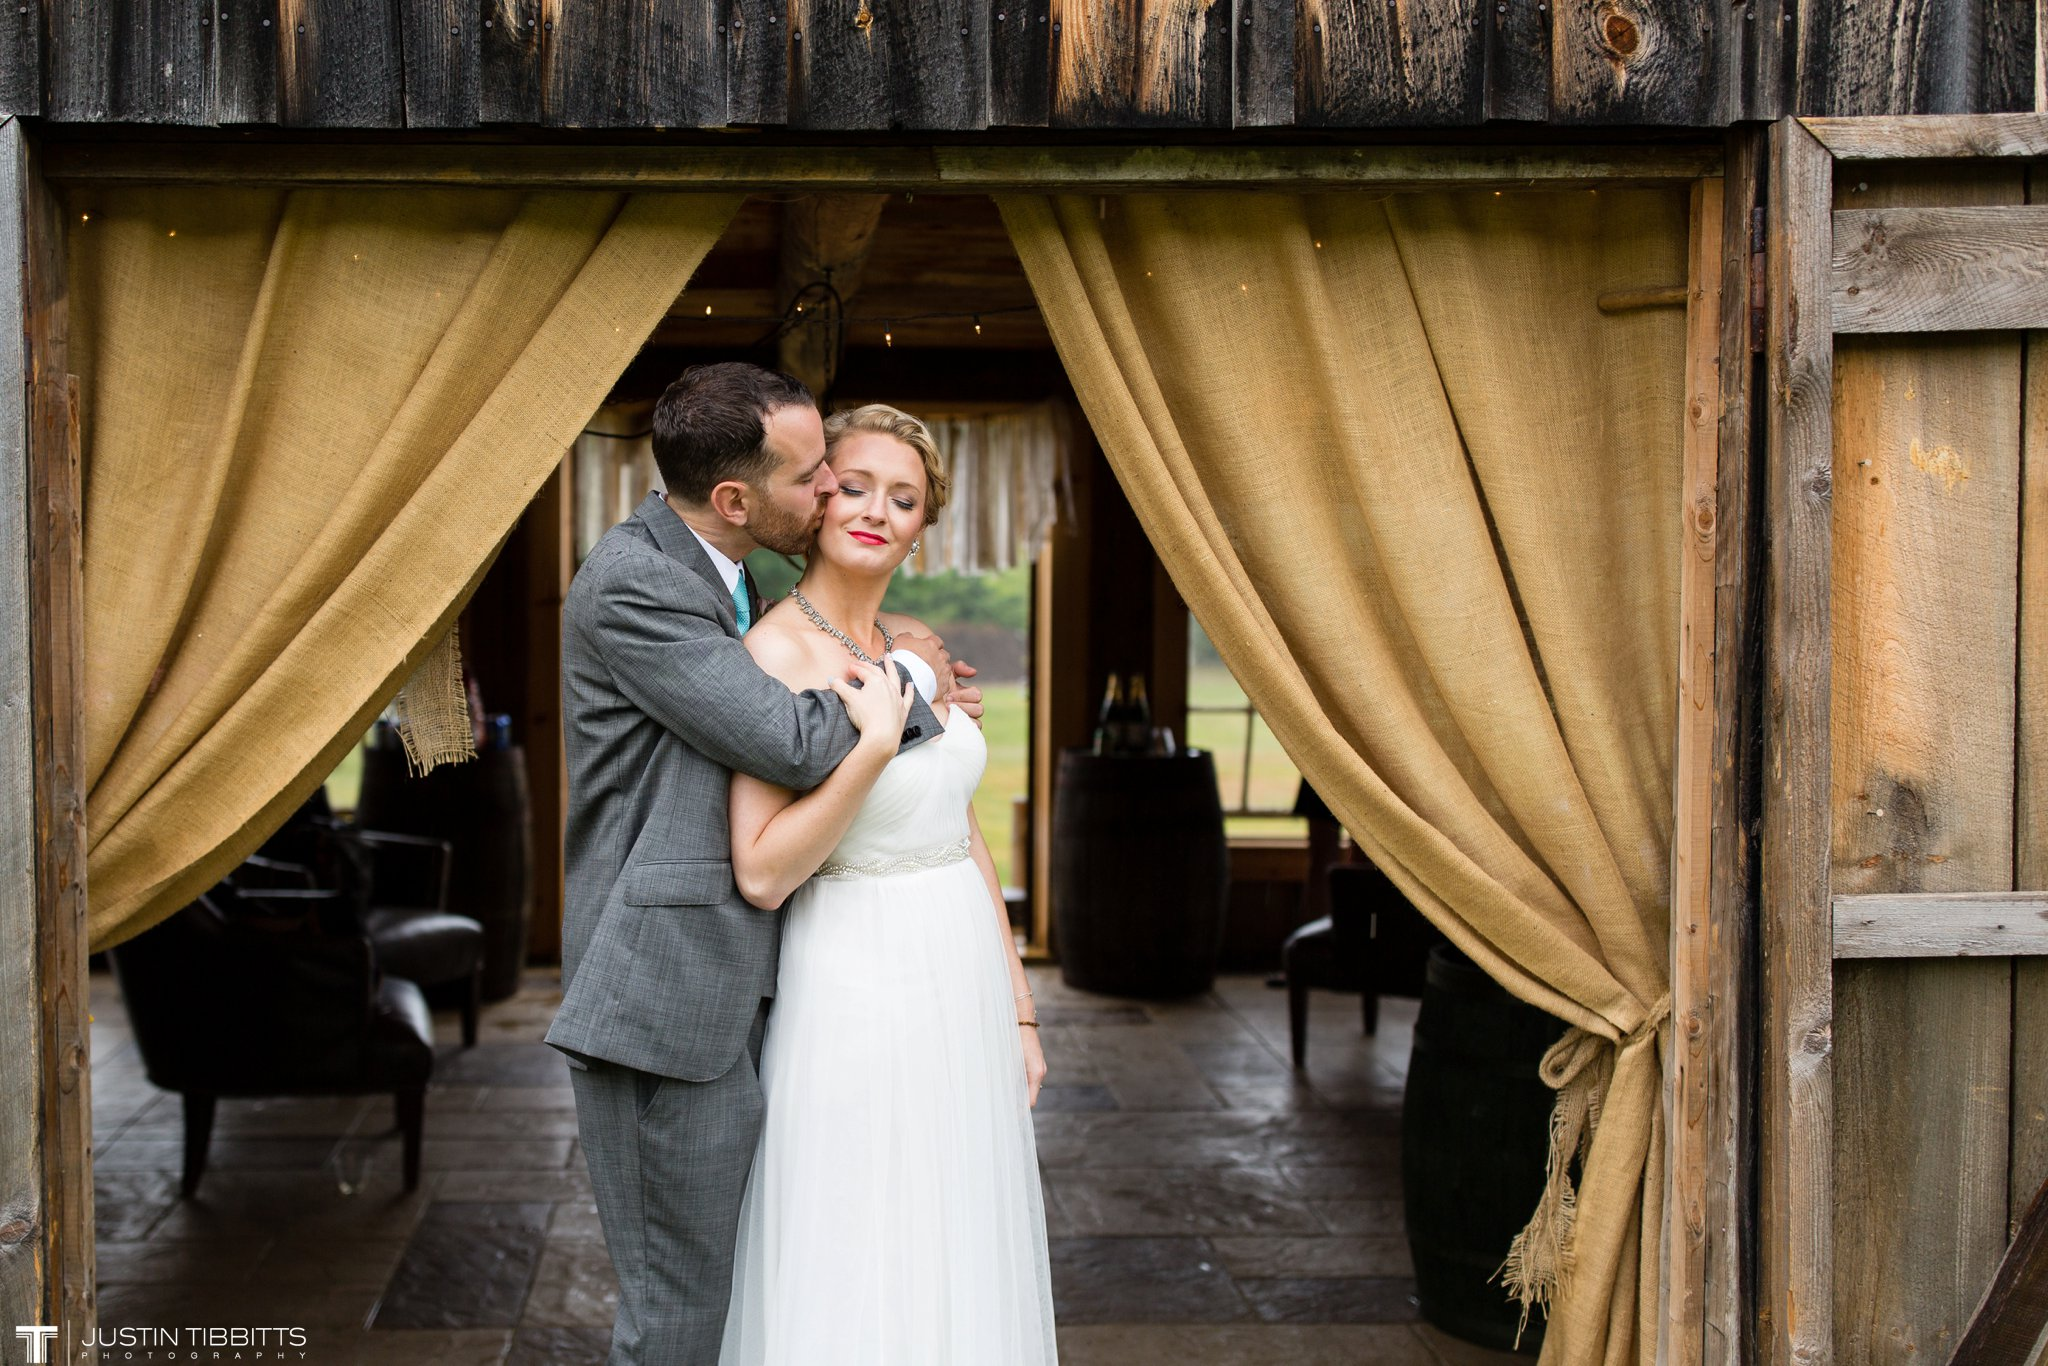 burlap-and-beams-wedding-photos-with-joran-and-molly_0088